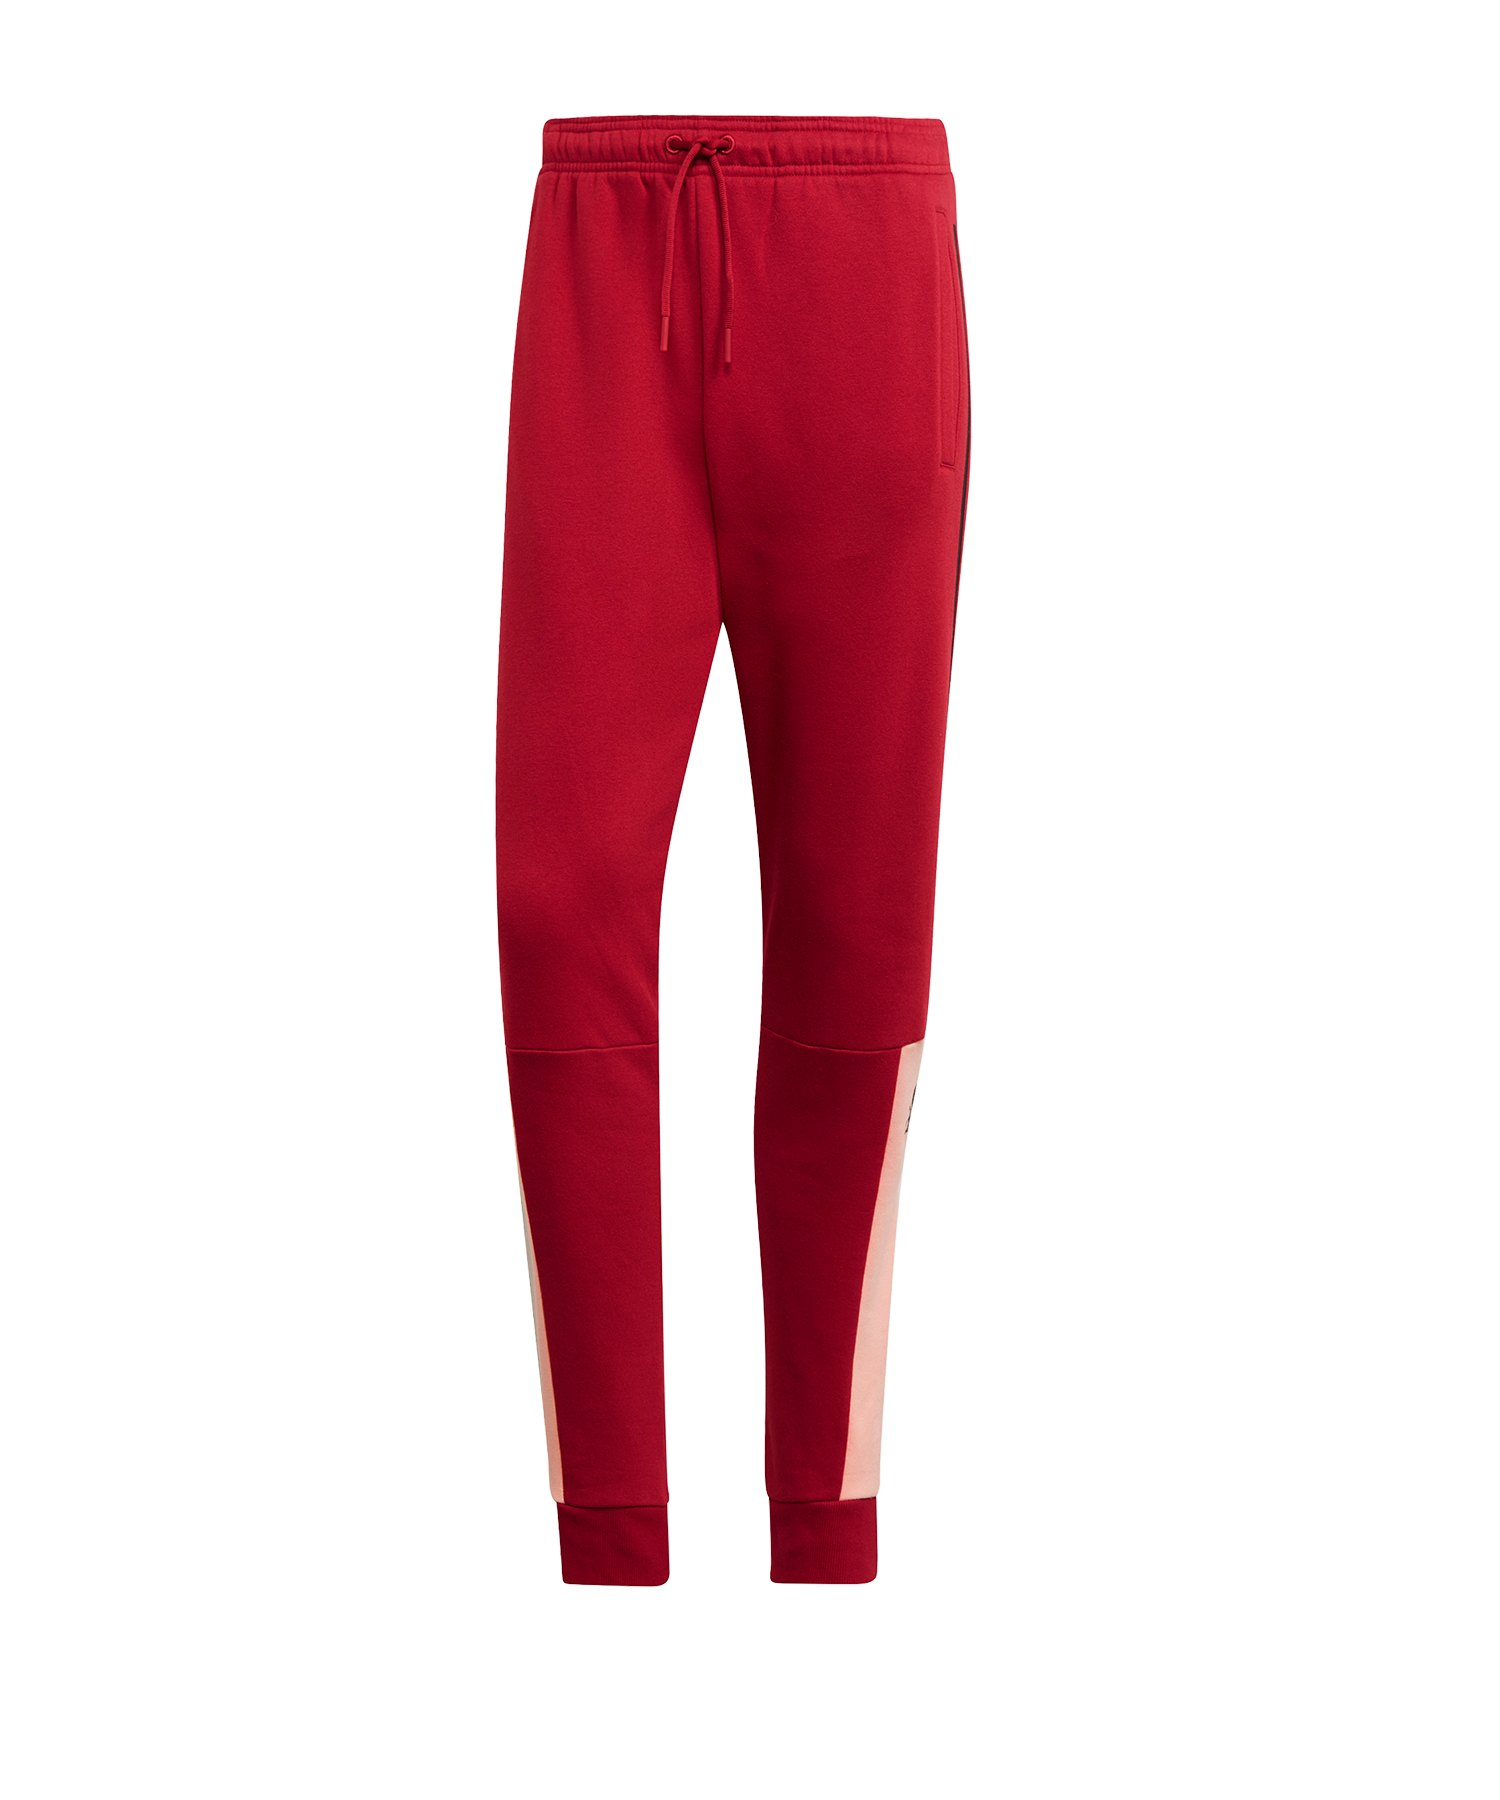 adidas SID Pant Jogginghose Rot